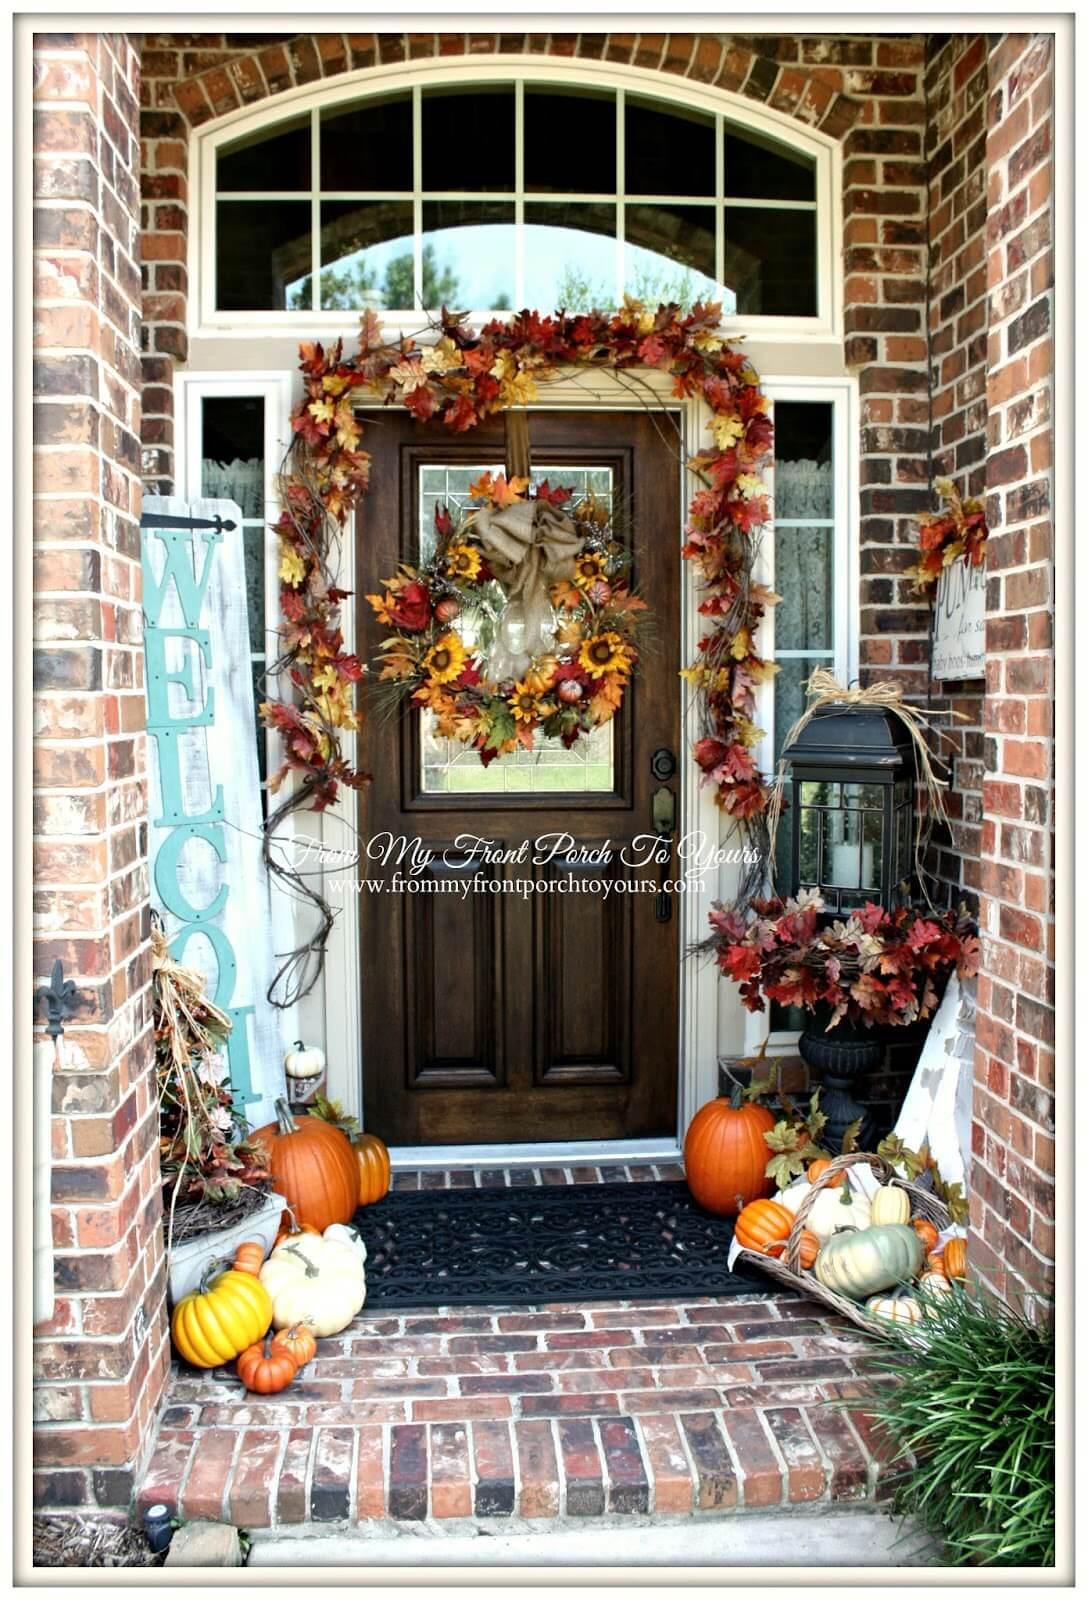 Pretty Fall Wreath and Garland